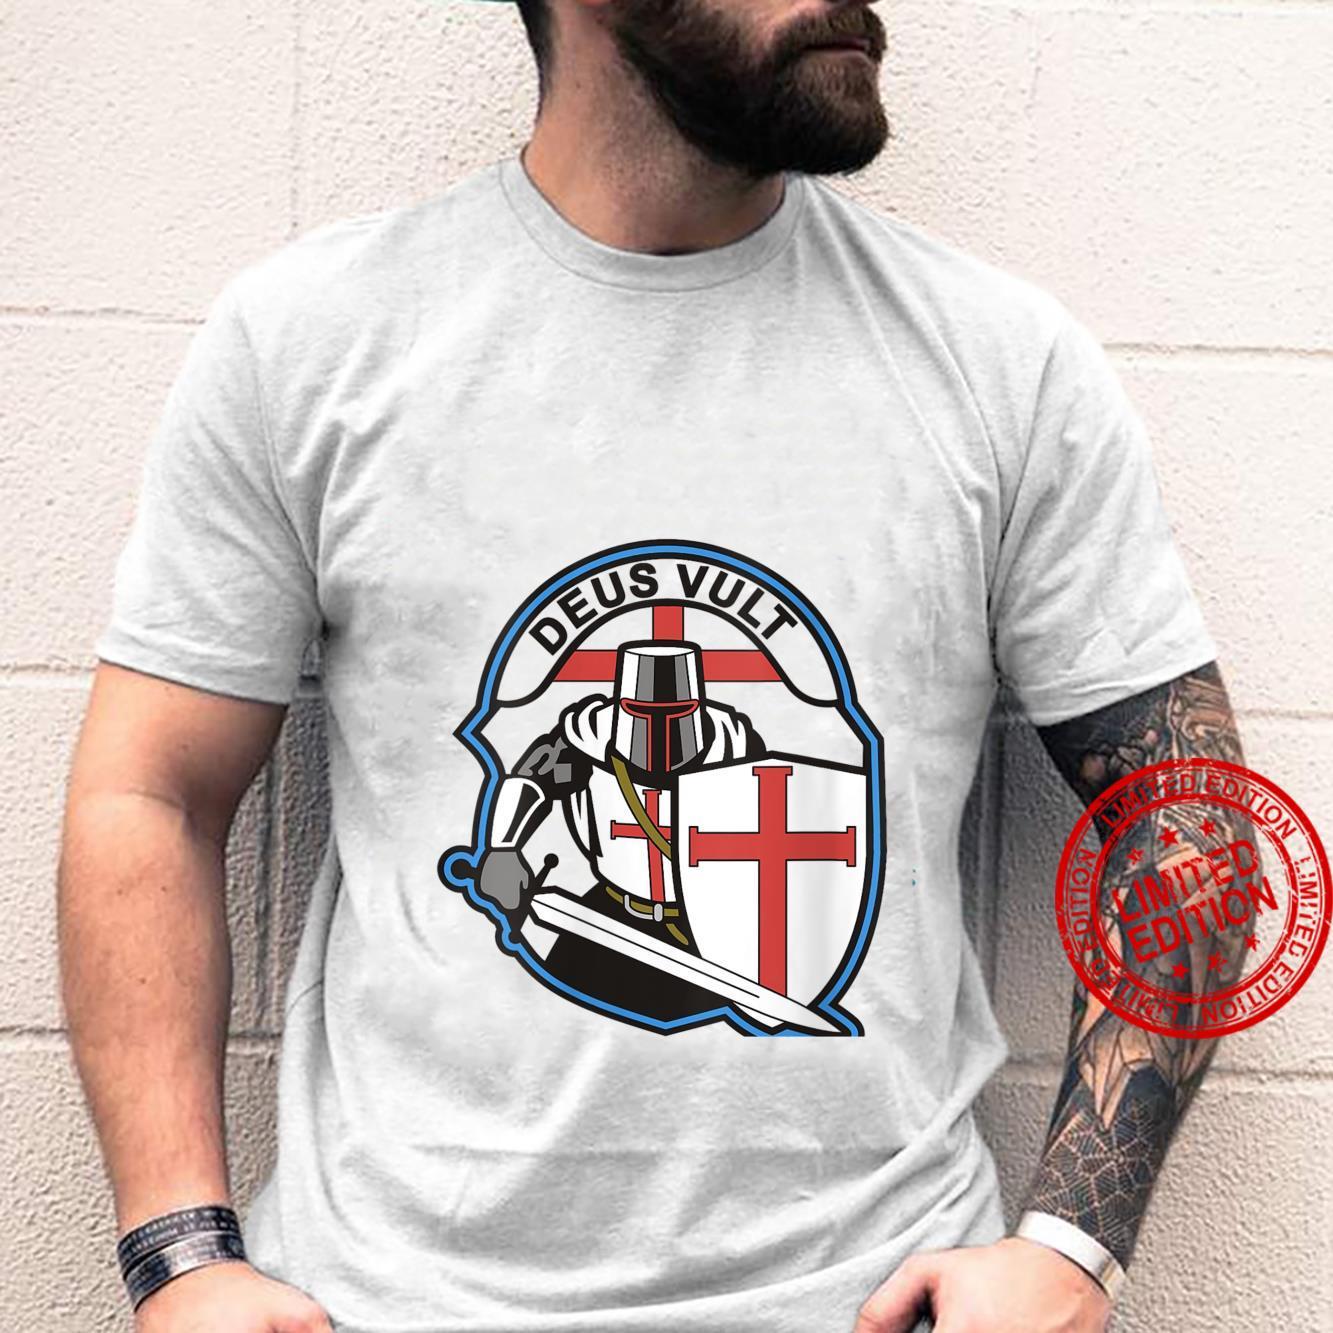 Womens DEUS VULT Knights Templar Crusader Airsoft Paintball Shirt